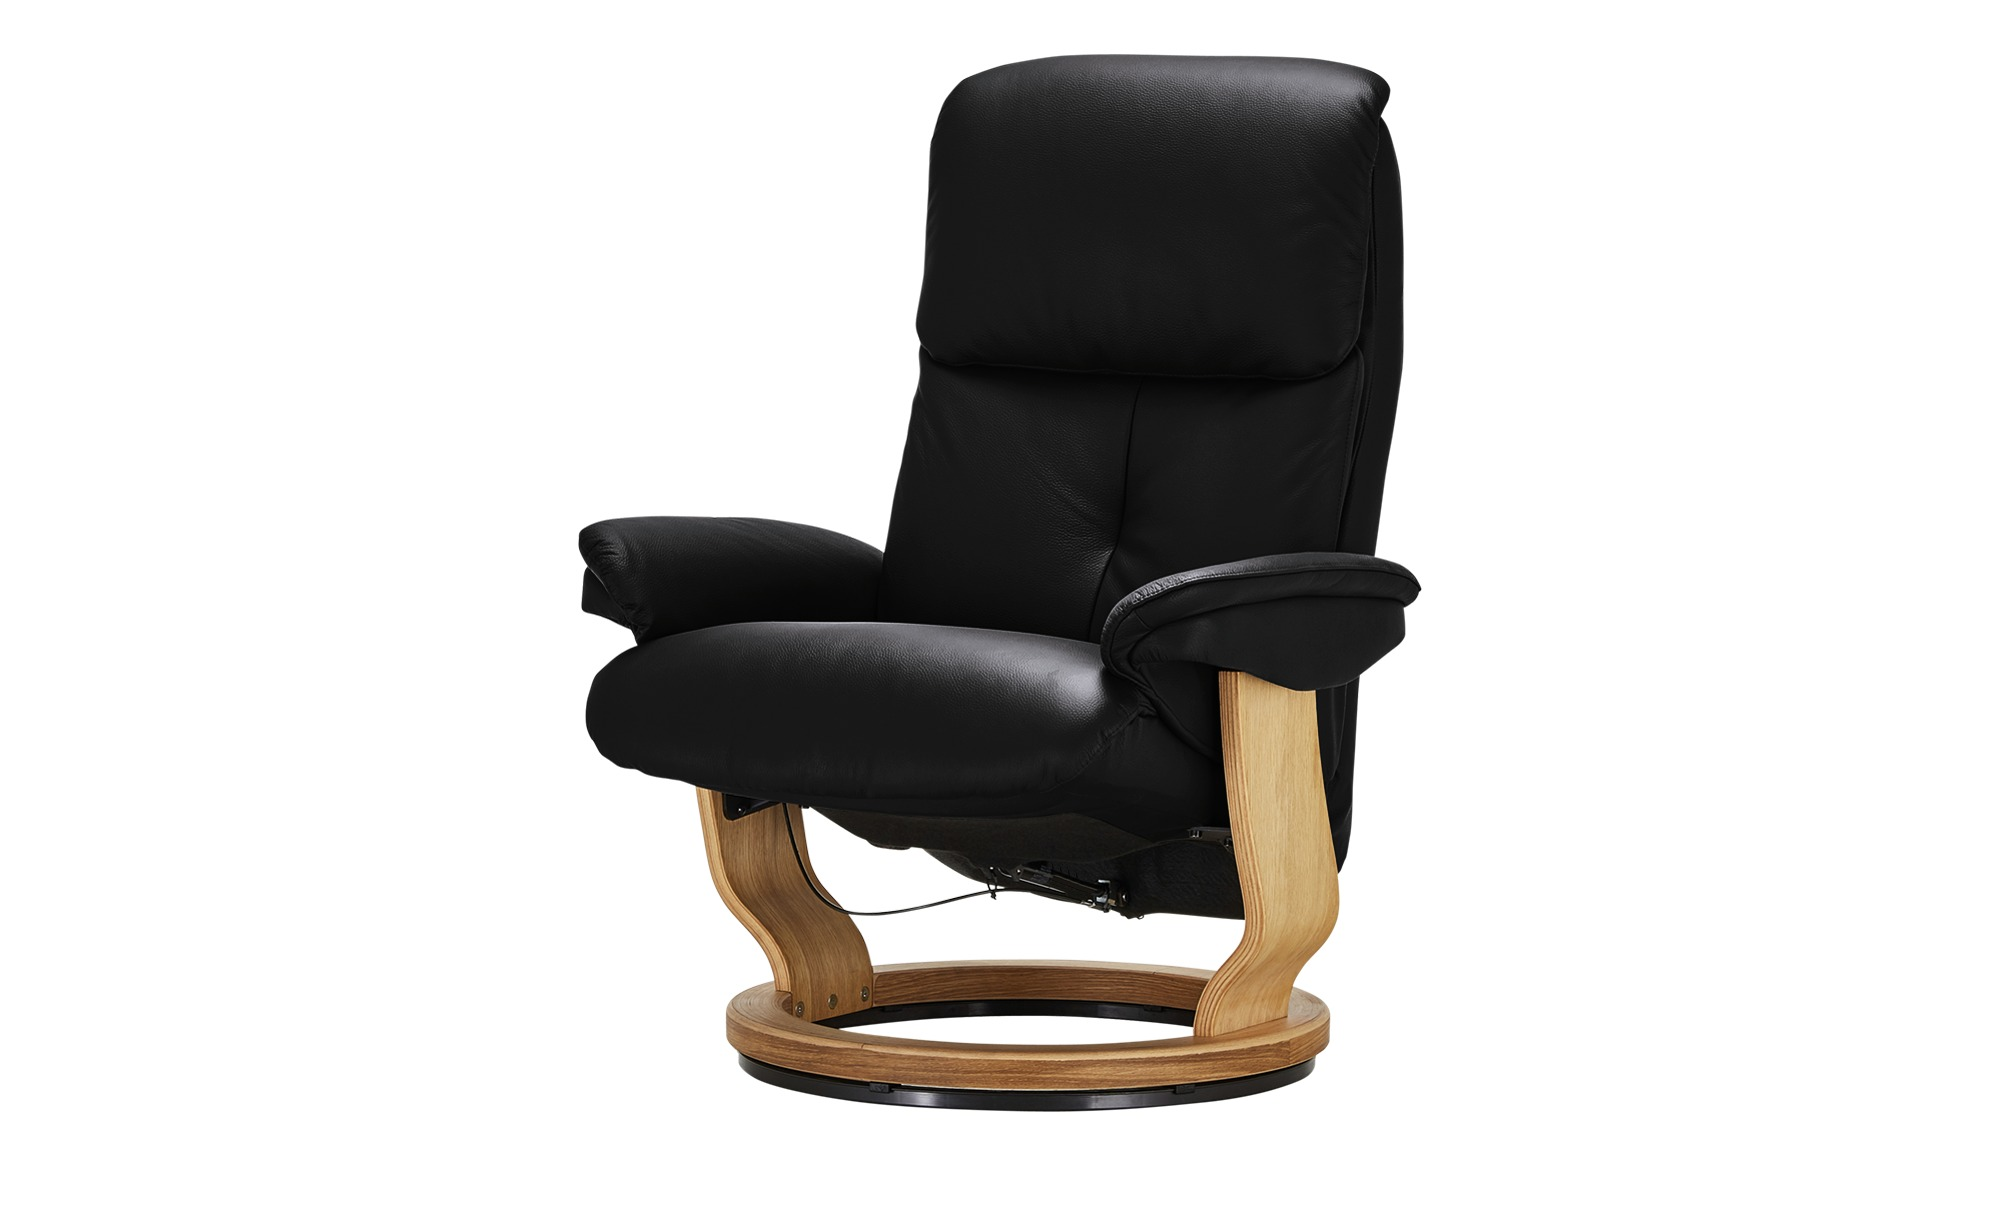 Relaxsessel  Farso ¦ schwarz ¦ Maße (cm): B: 85 H: 114 T: 92 Polstermöbel > Sessel > Drehsessel - Höffner